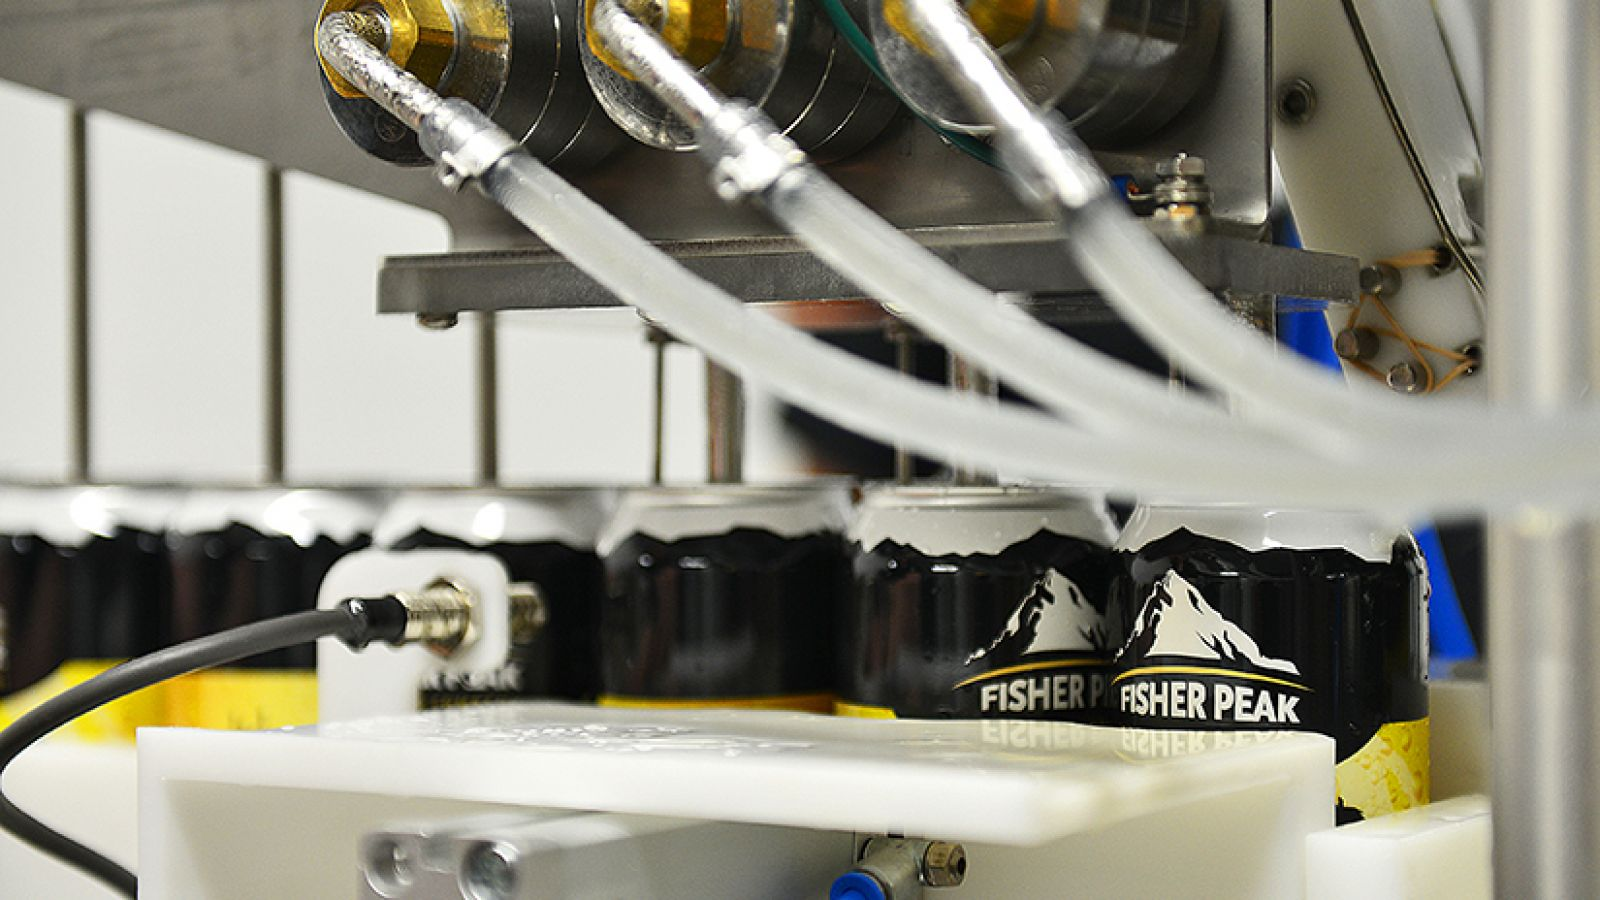 Fisher Peak Brewing Company.